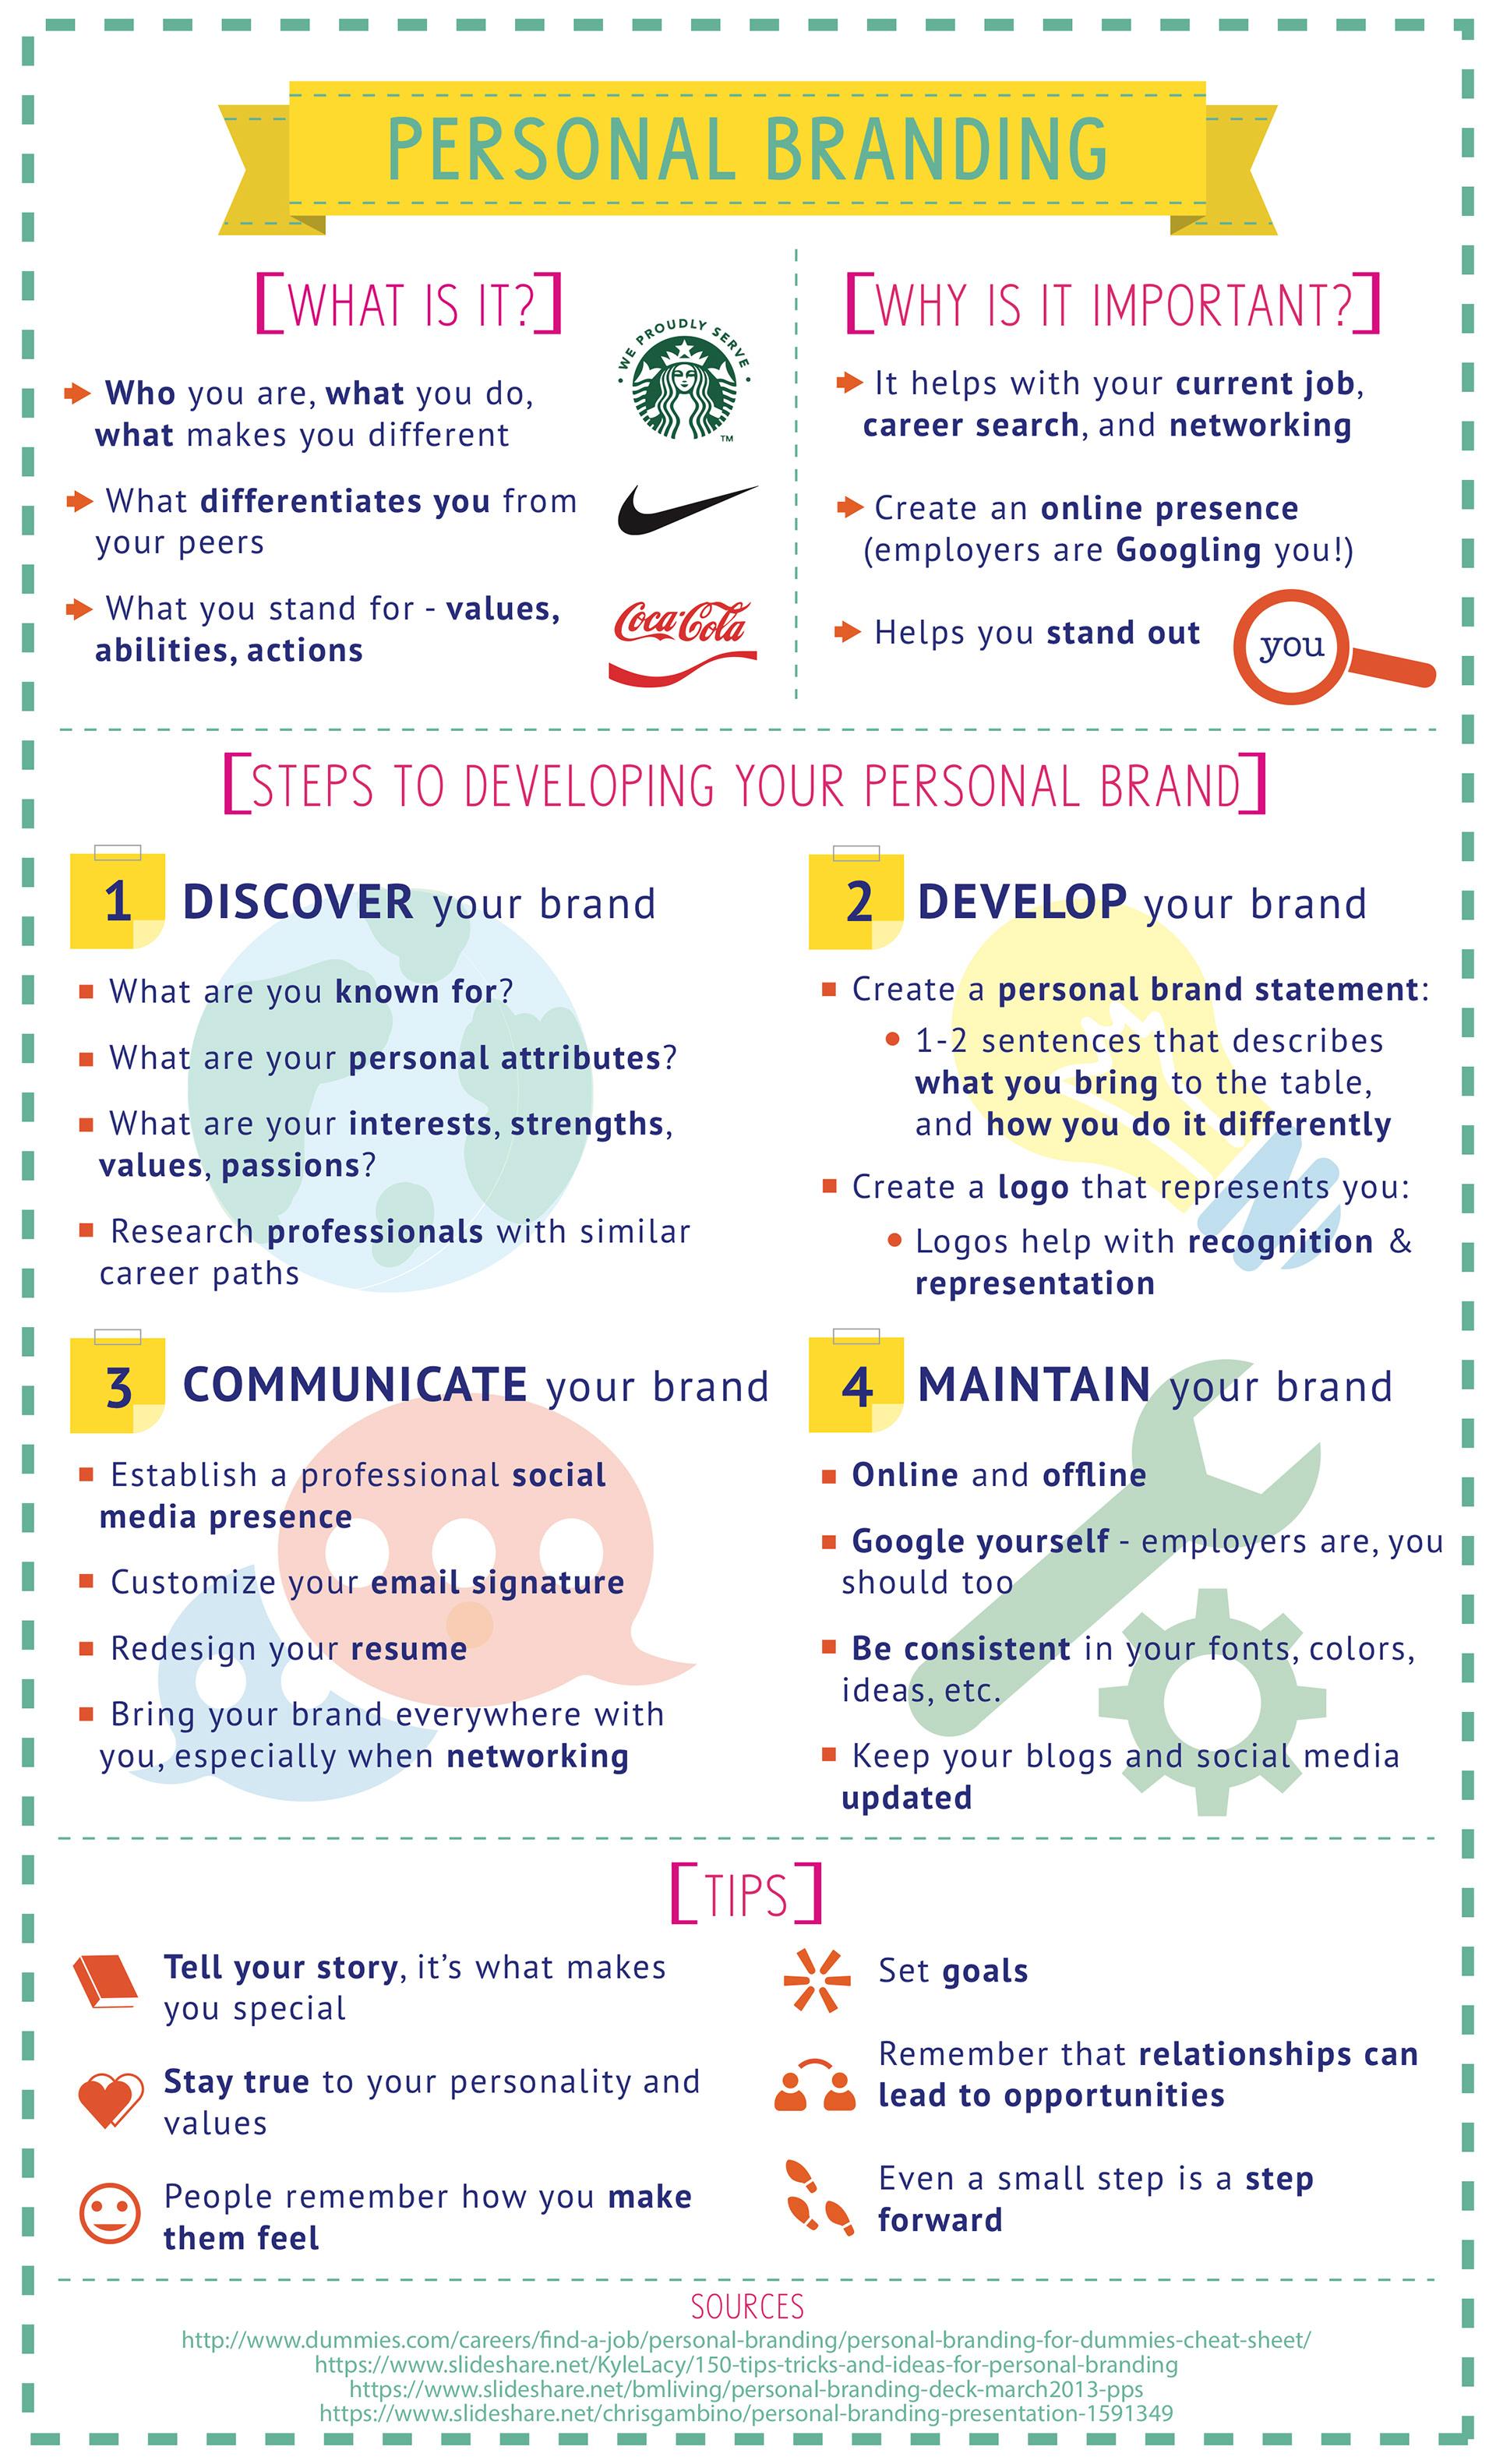 alison geoffrey - personal branding handout, Powerpoint templates